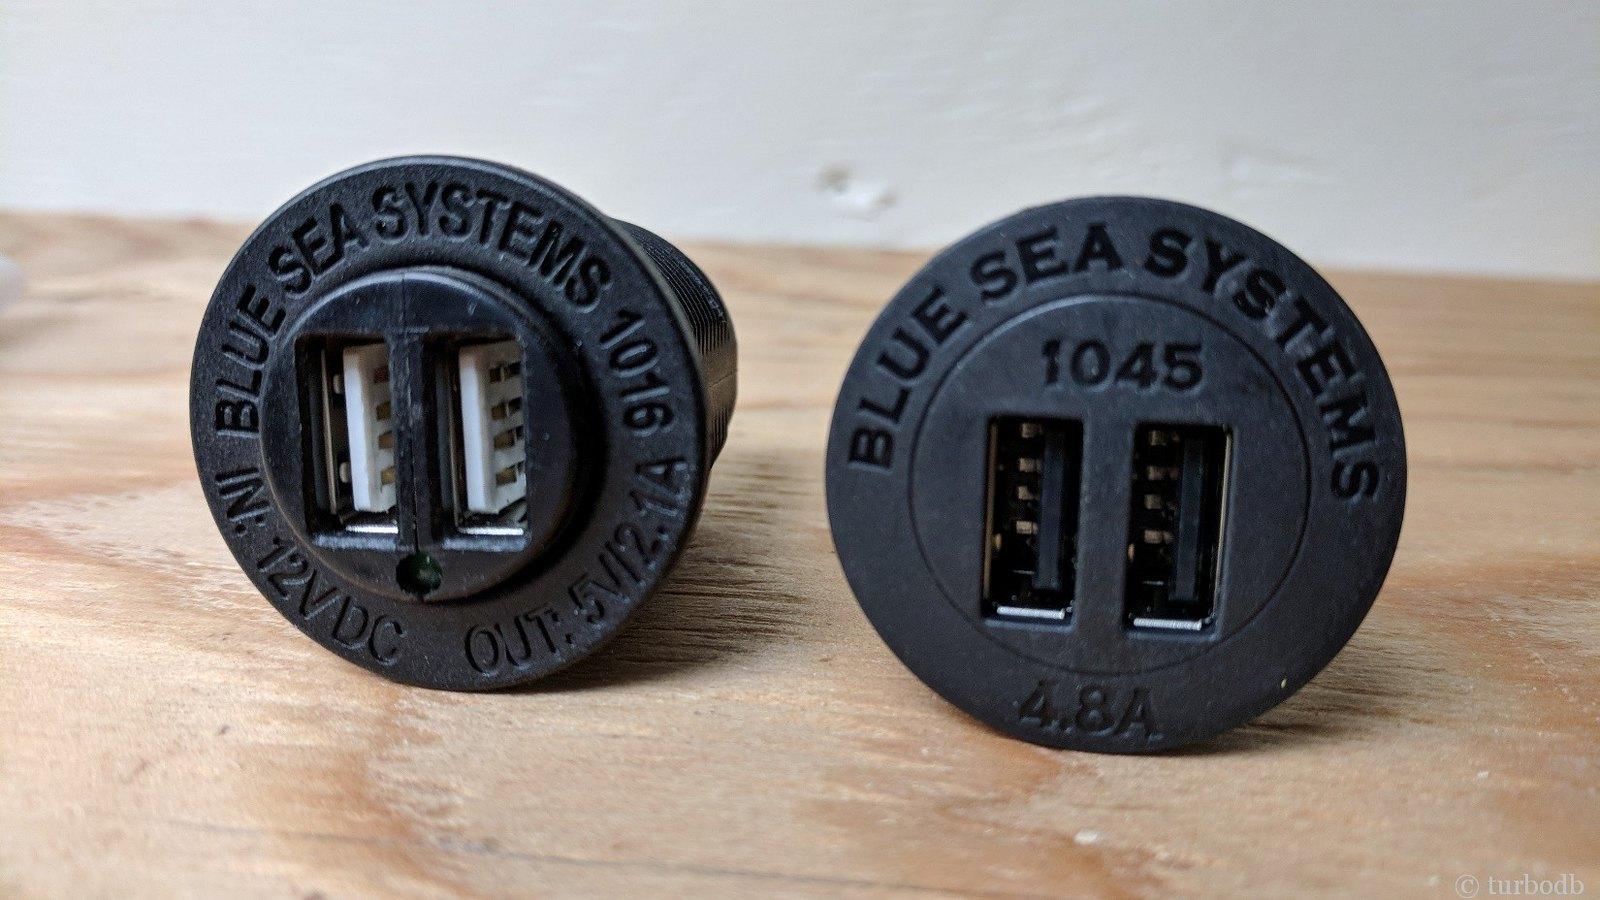 Mod Wars - USB charger blocking Ham Radio Communication